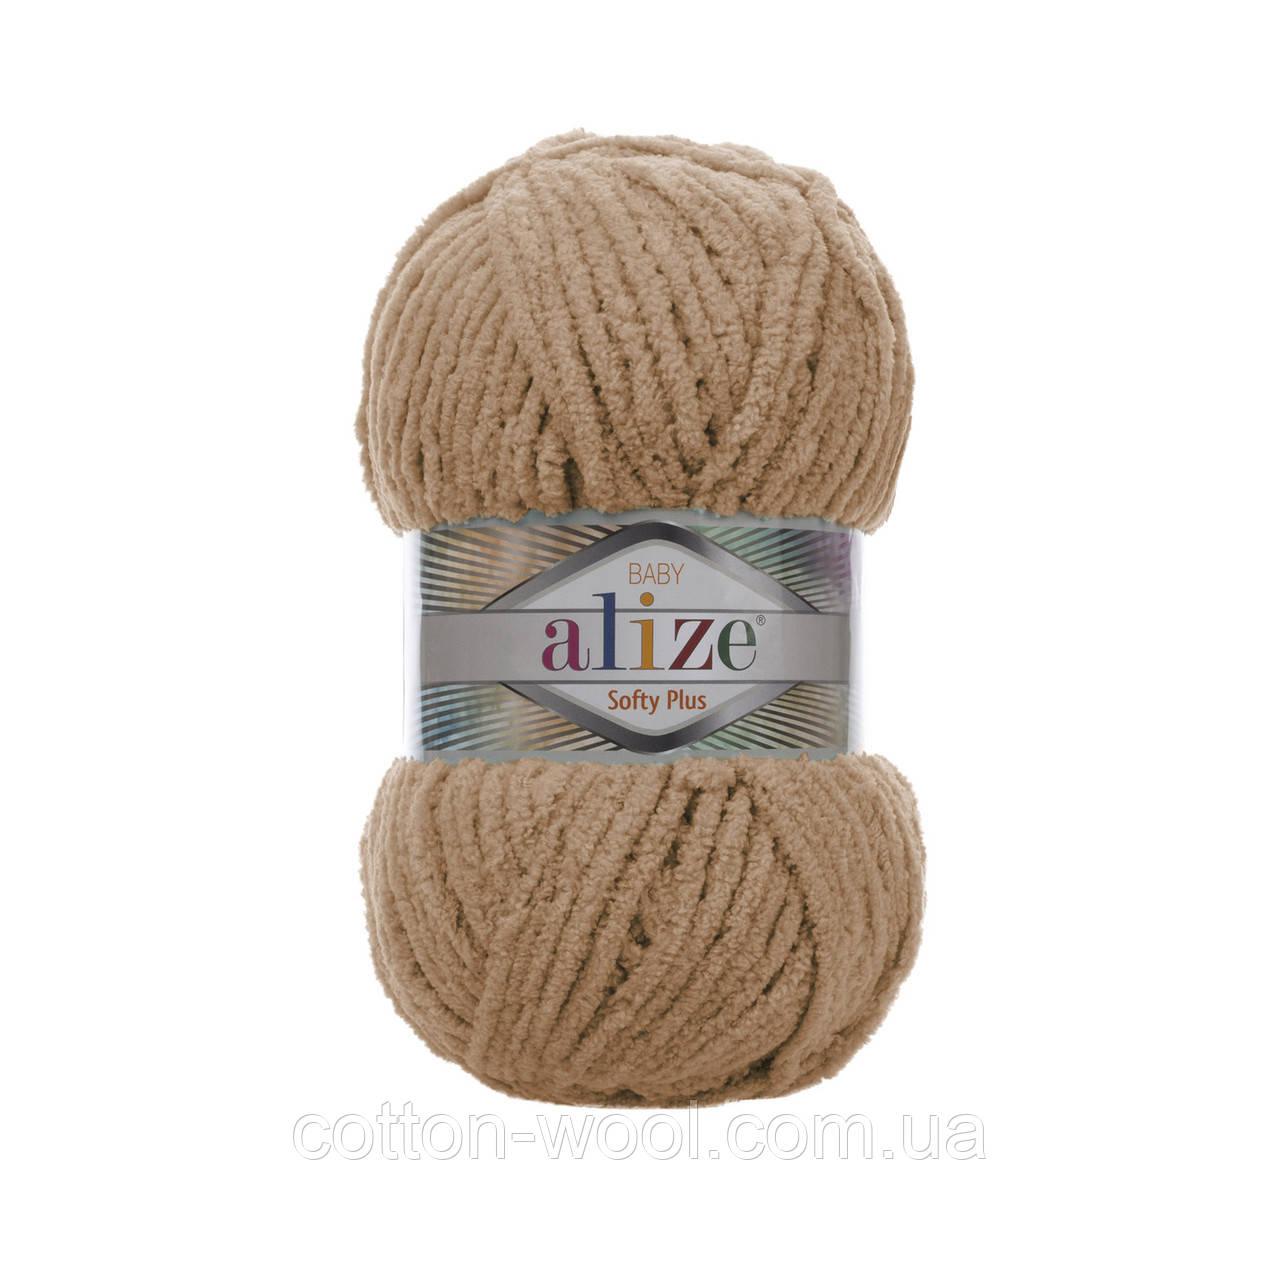 Softy Plus (Софти плюс) 100% - микрополиєстер 199